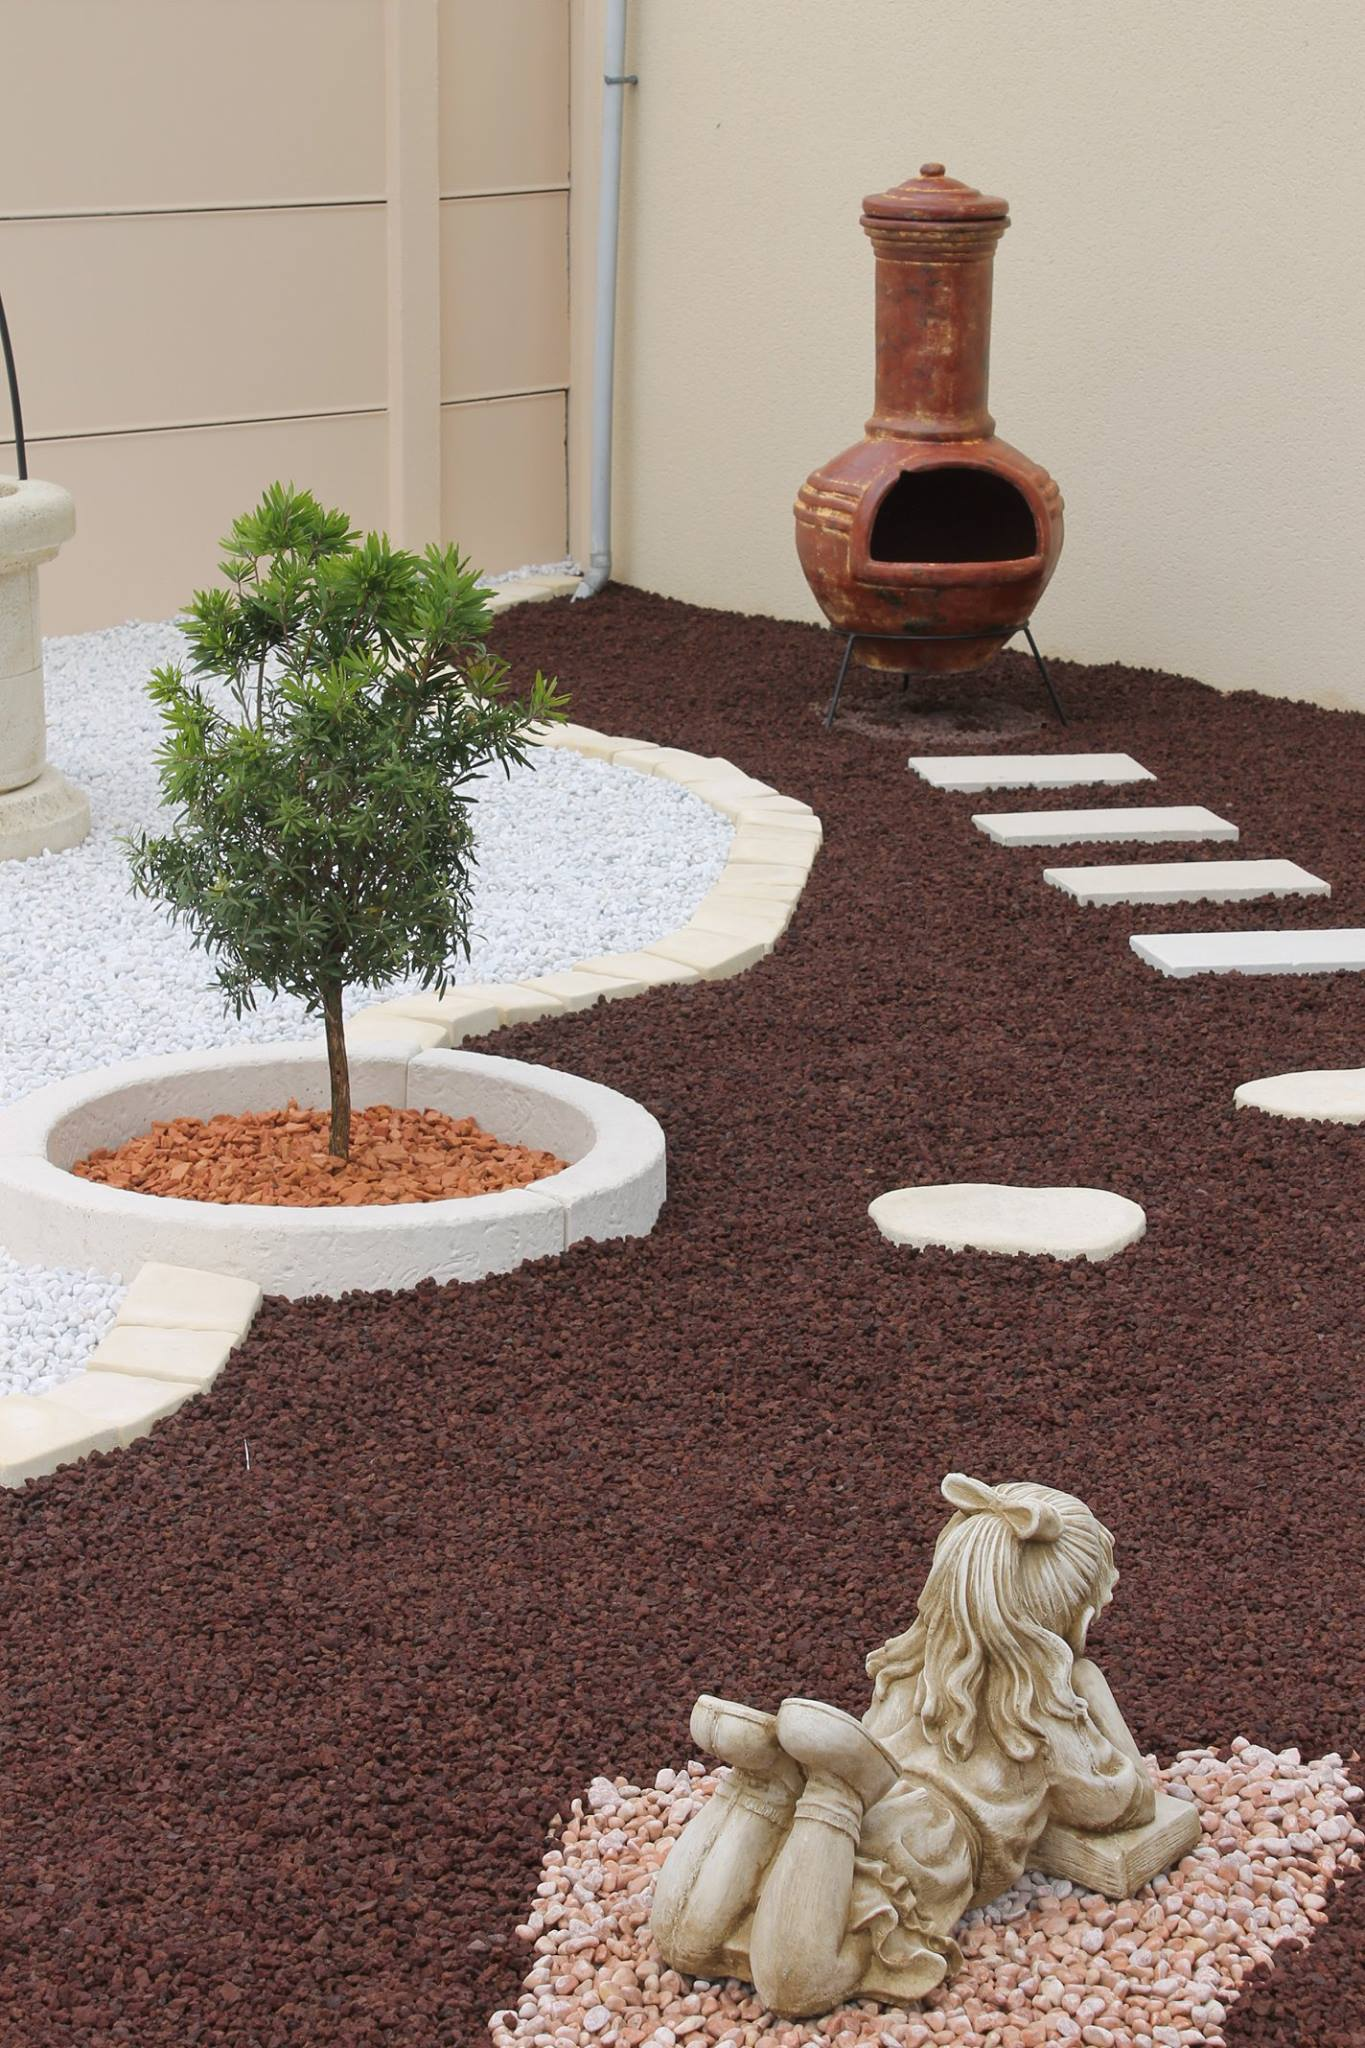 trouver-une-idee-deco-jardin-aublet-fabricant • Moulin de ...